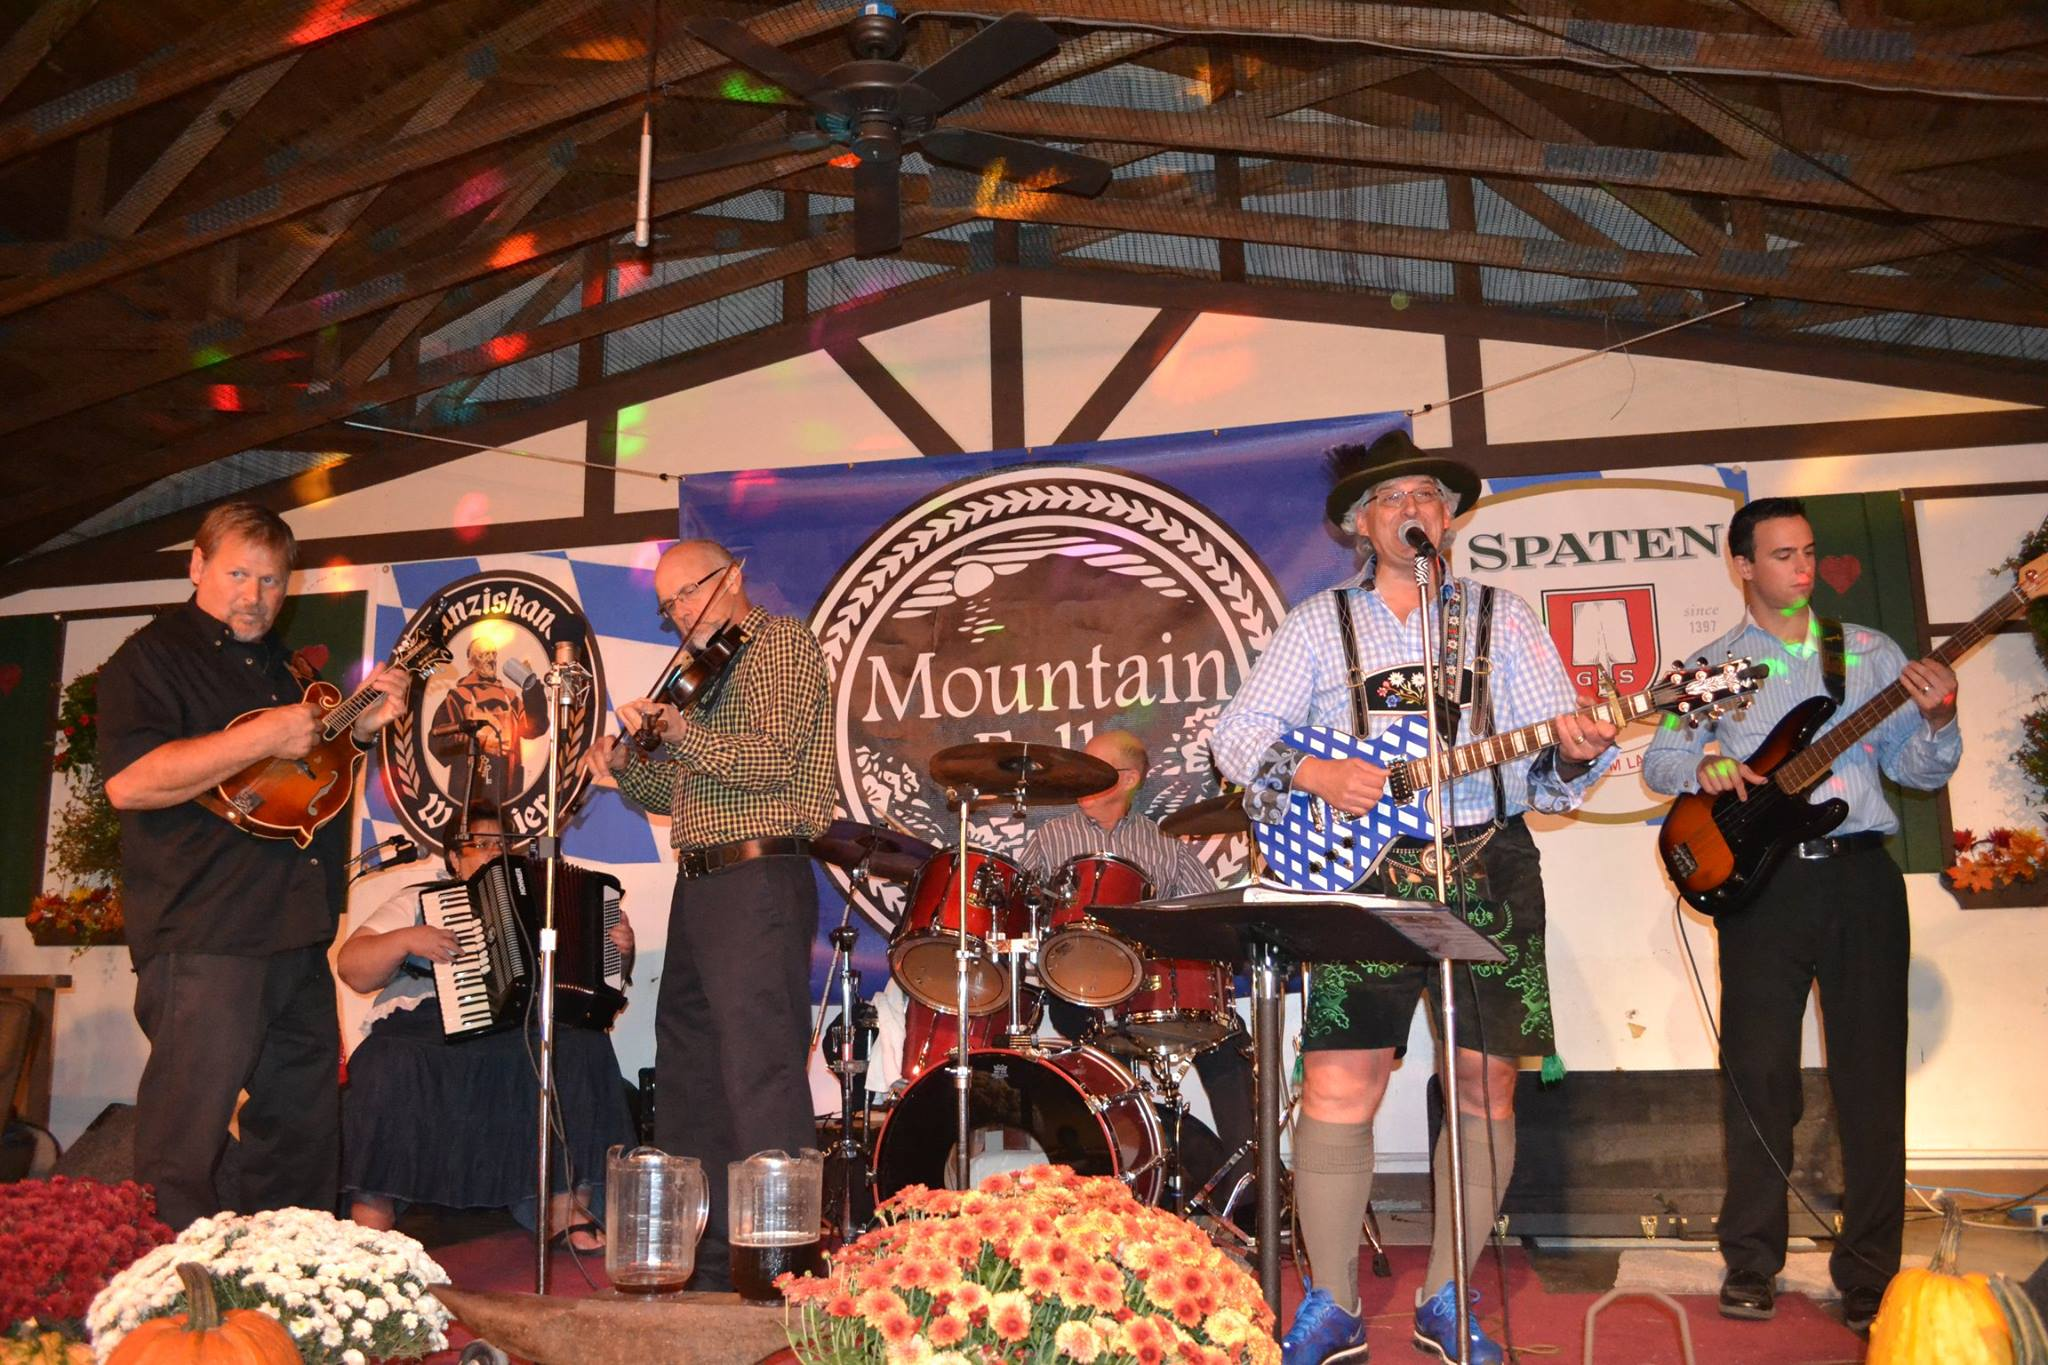 Dave kline & the Mountain folk fest band